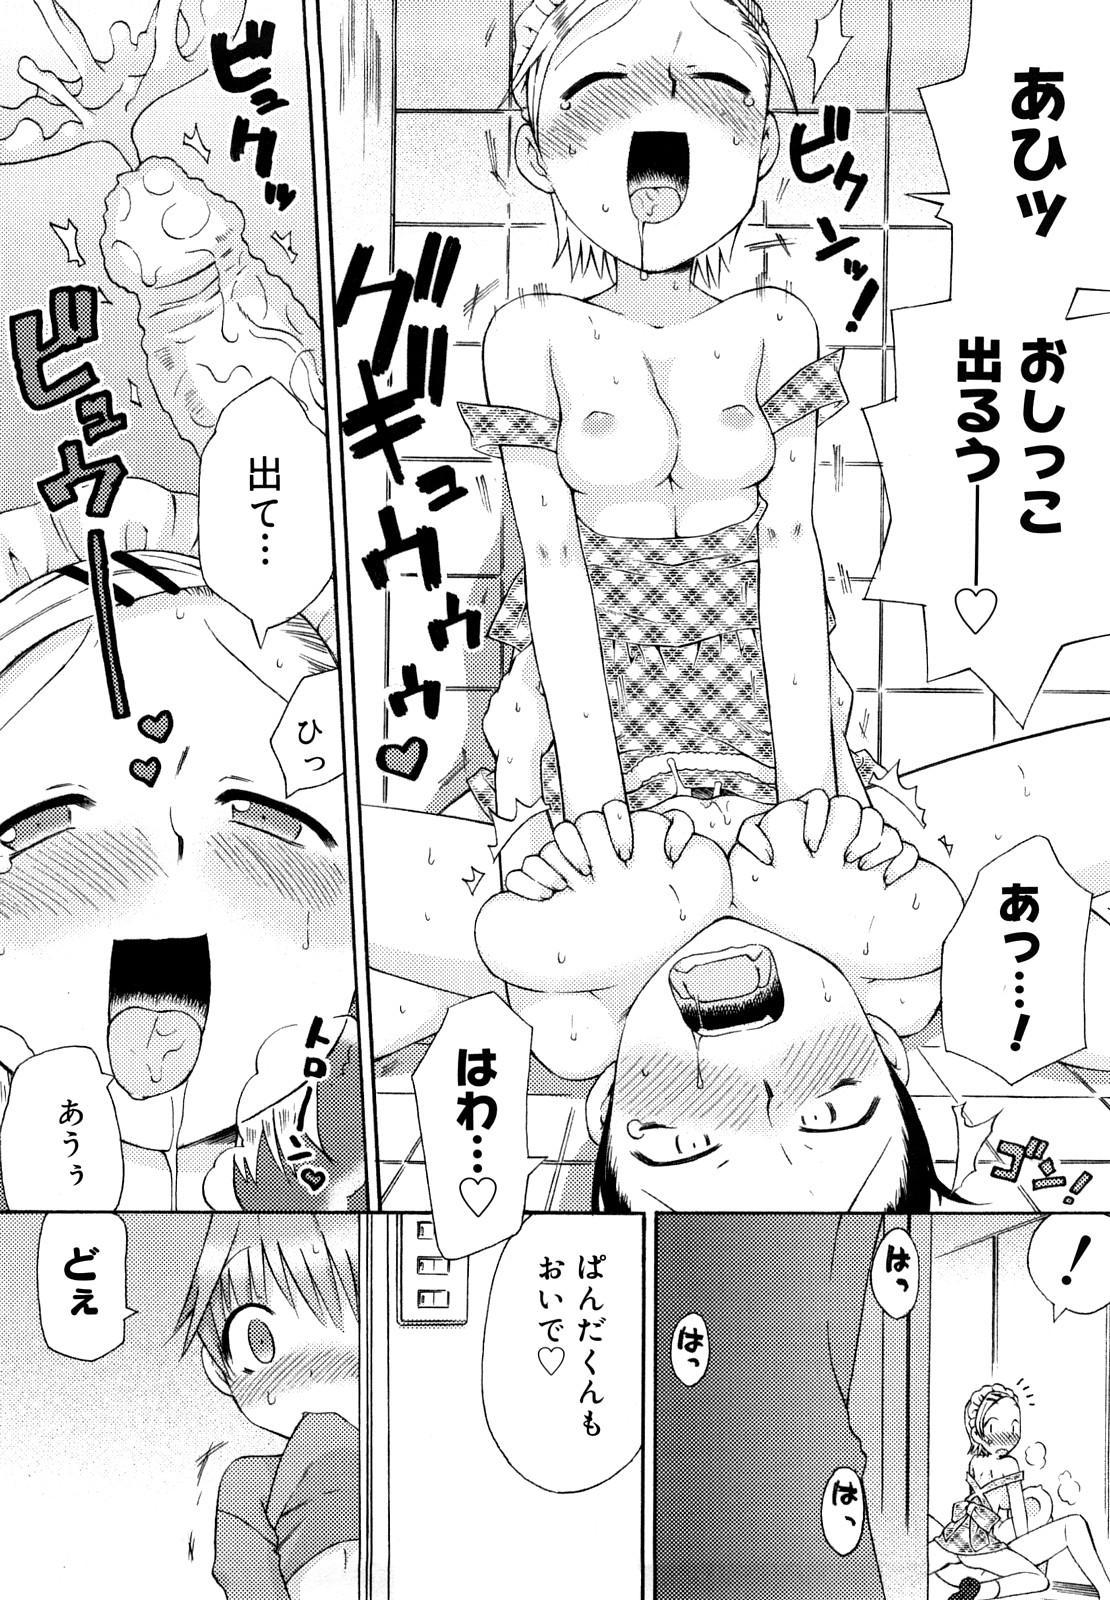 Hatsuden Pandakun! Shinsouban 104